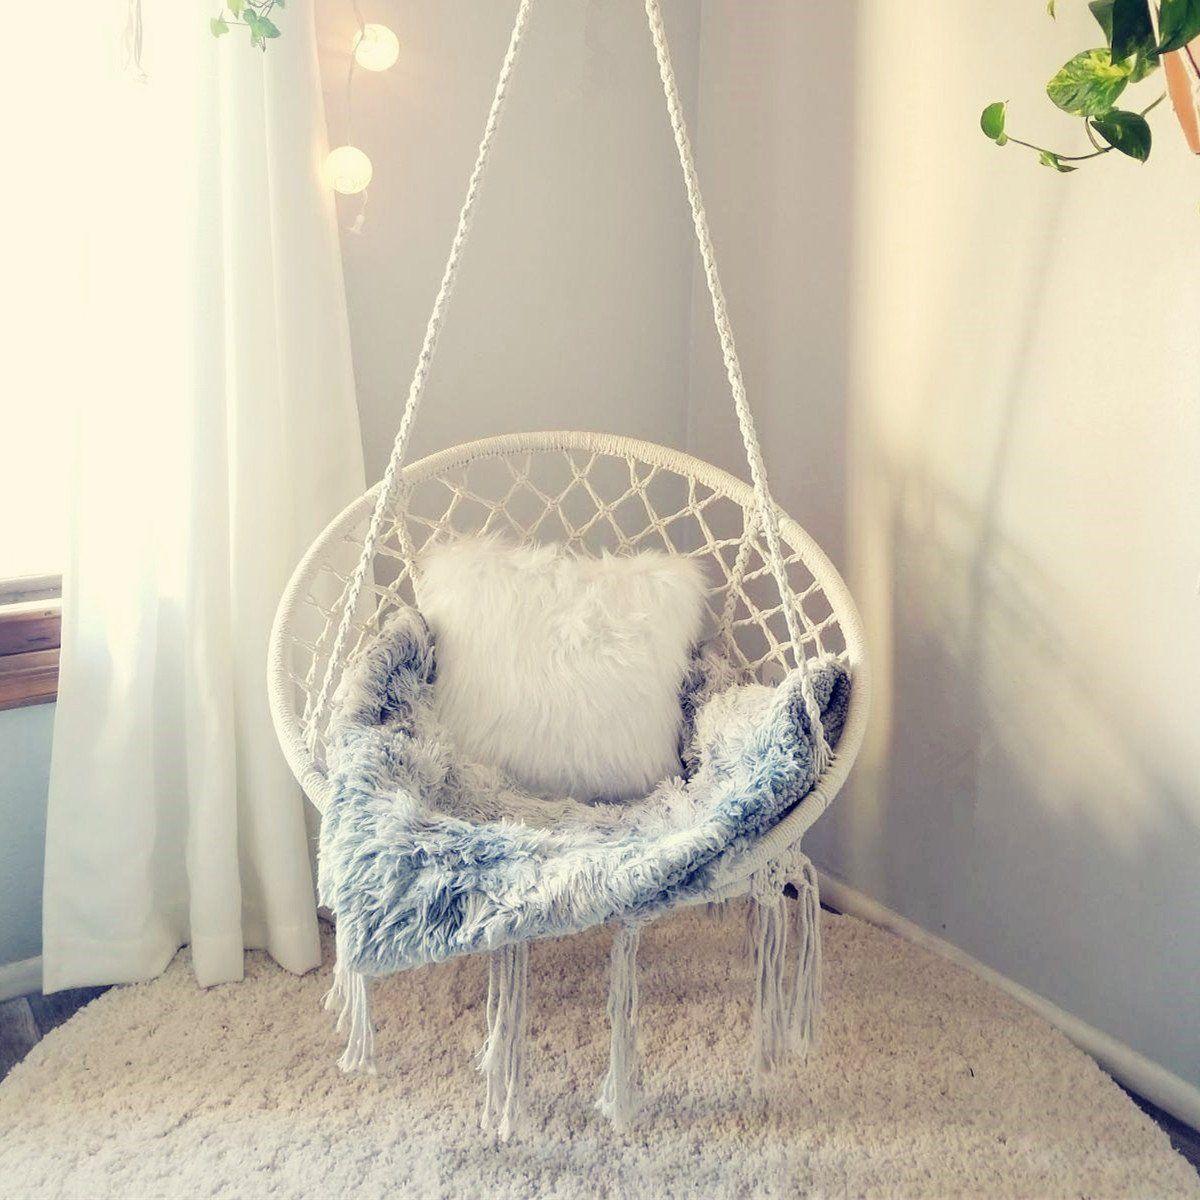 Handmade Bohemian Chic Macrame Hanging Chair In 2020 Hammock Swing Chair Hanging Swing Chair Swinging Chair